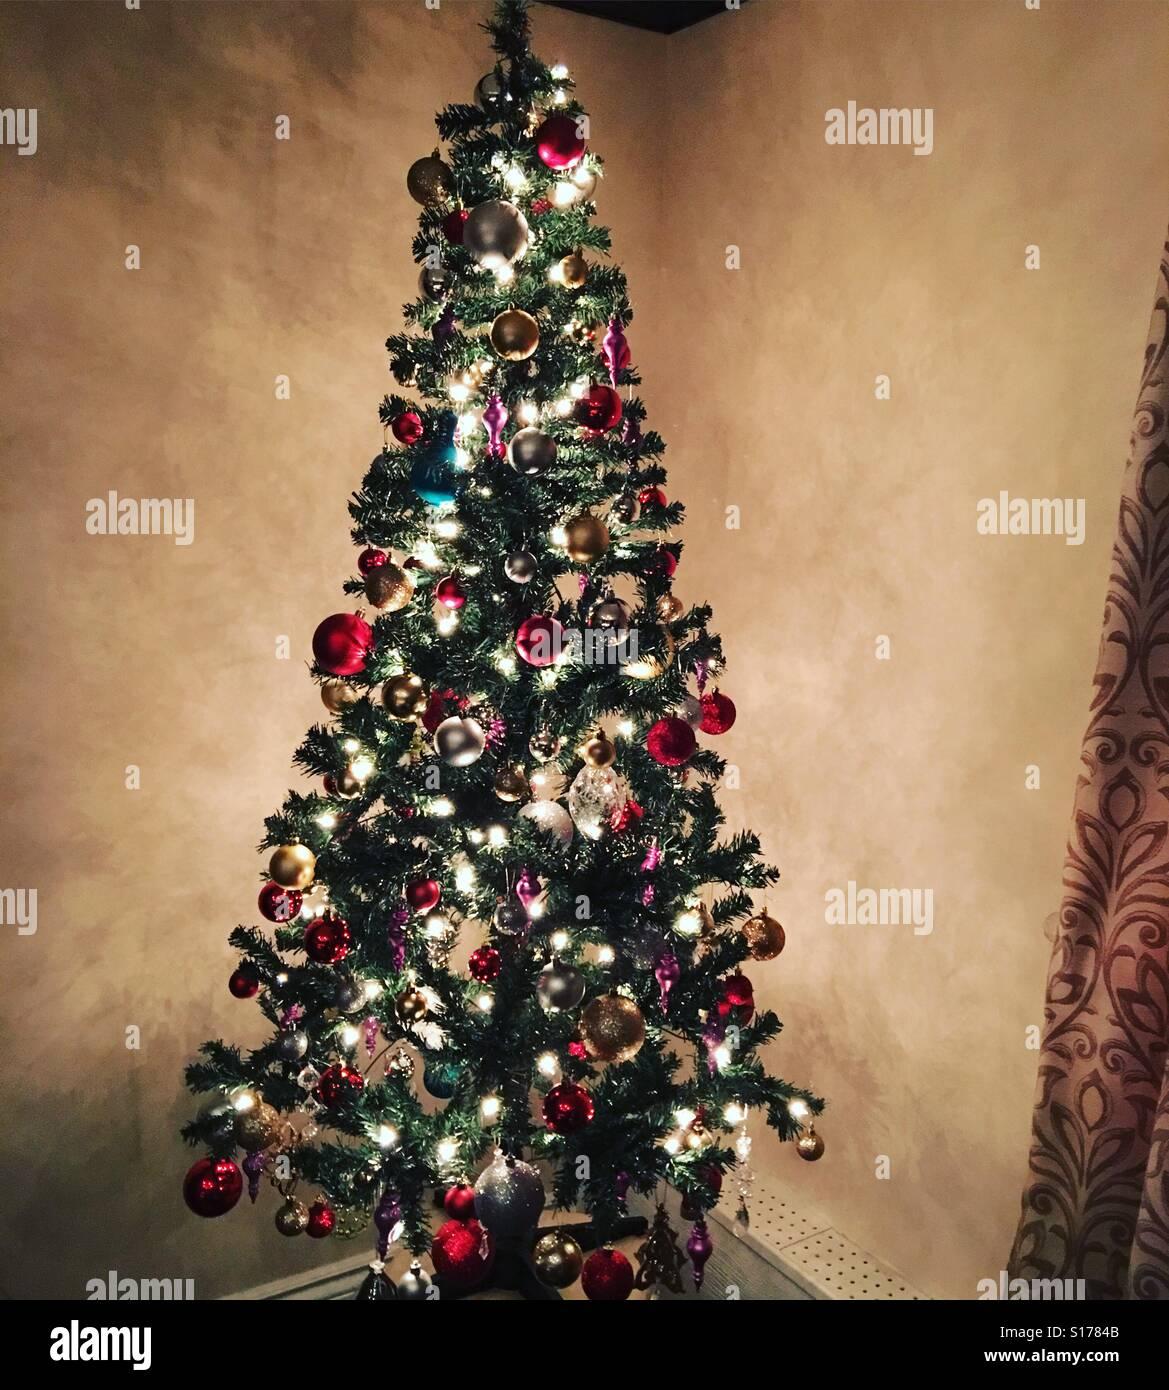 Oh Christmas Tree - Stock Image